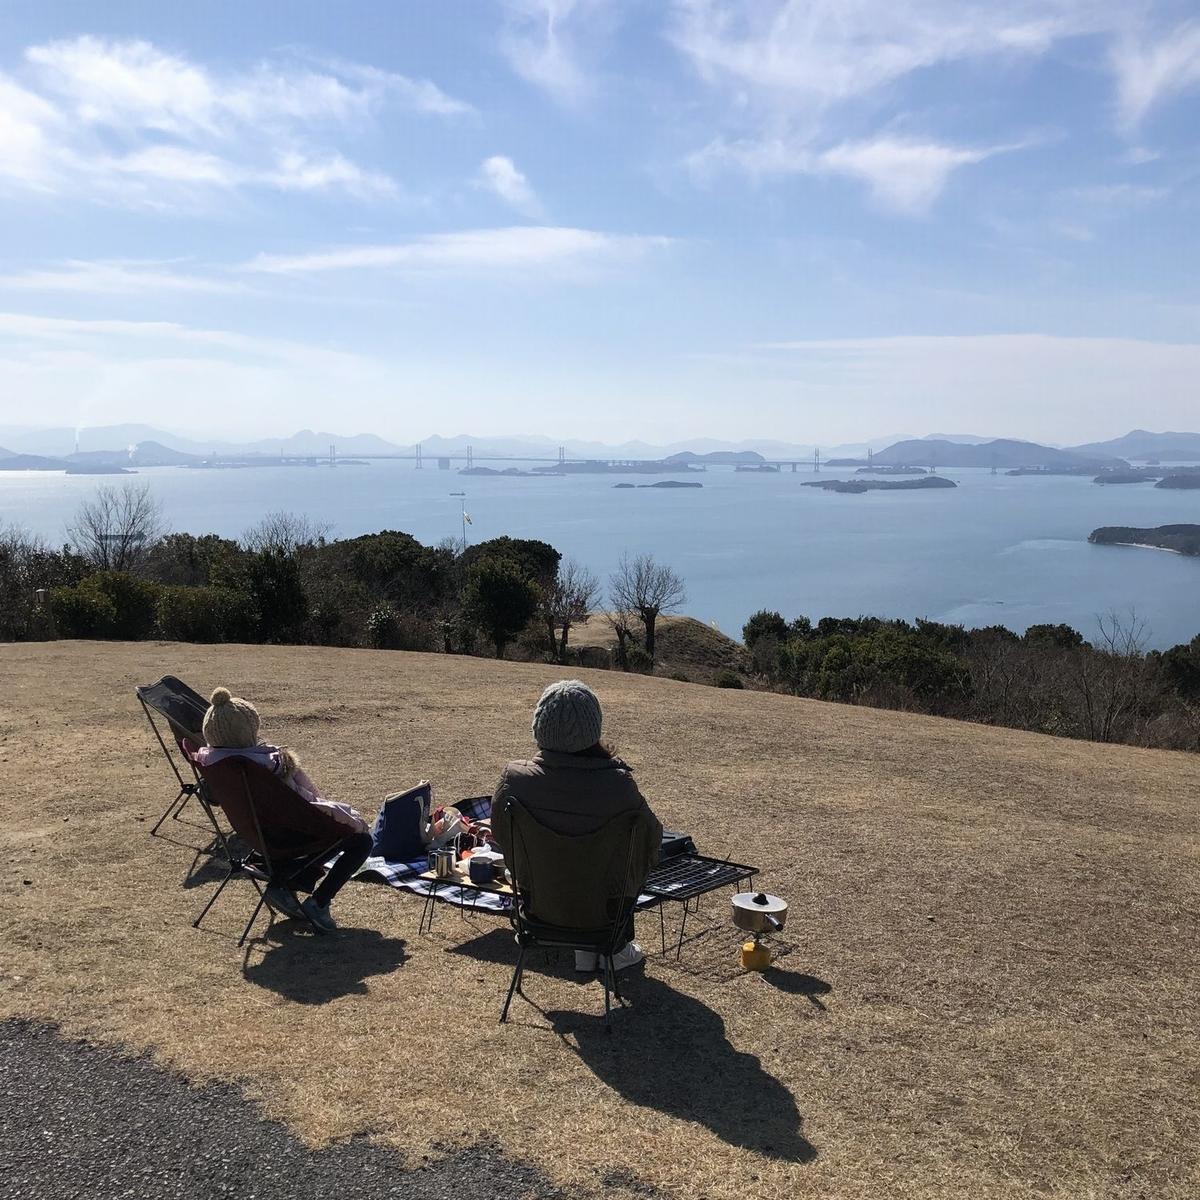 f:id:shiratsume:20200212131413j:plain